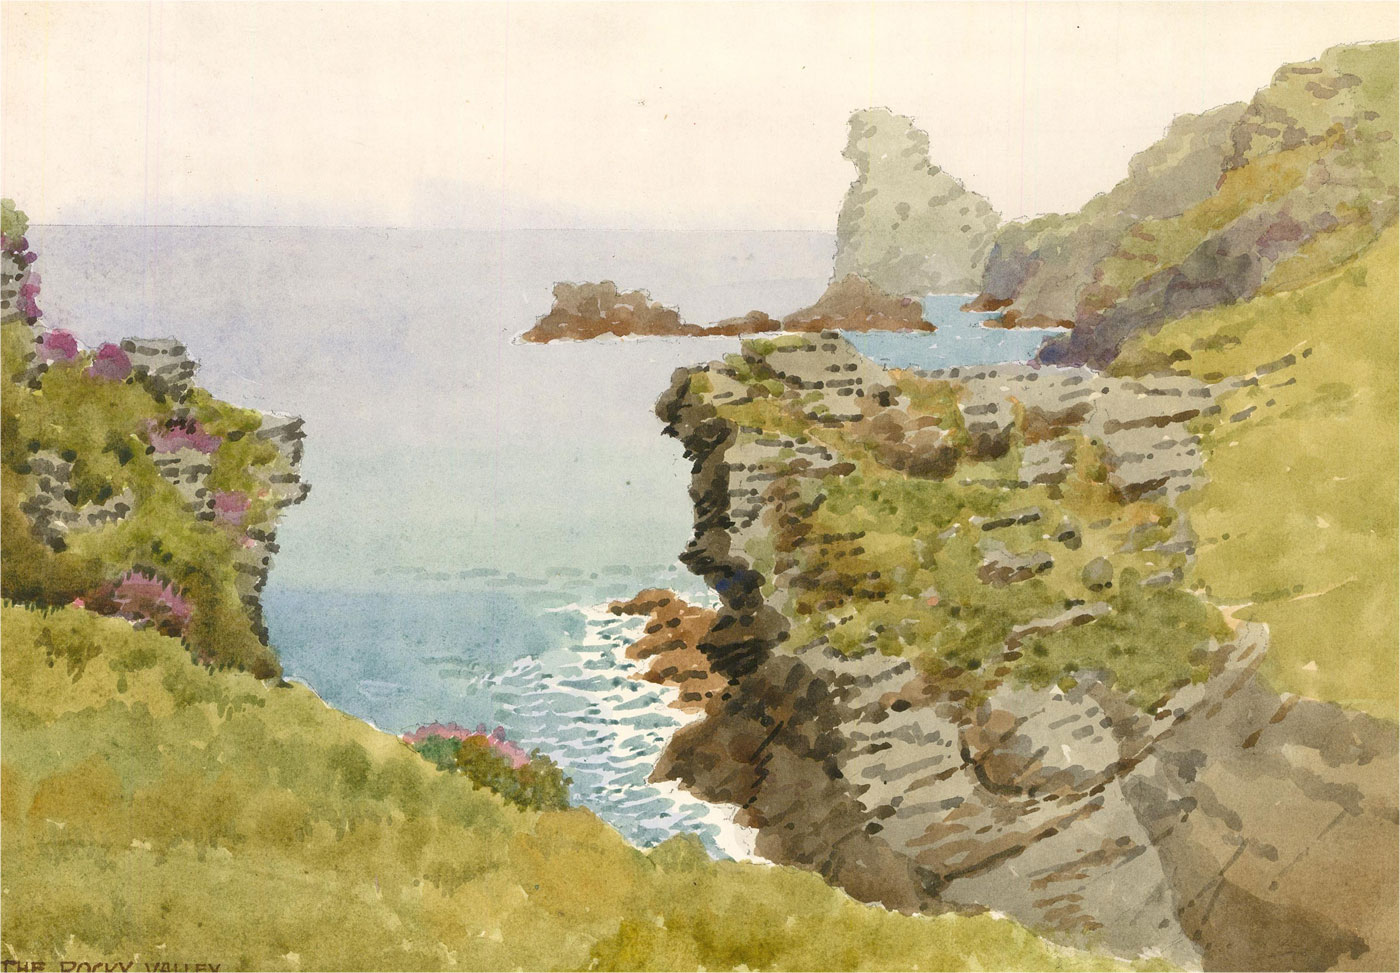 Raymond Turner Barker (1872-1945) - 1931 Watercolour, The Rocky Valley